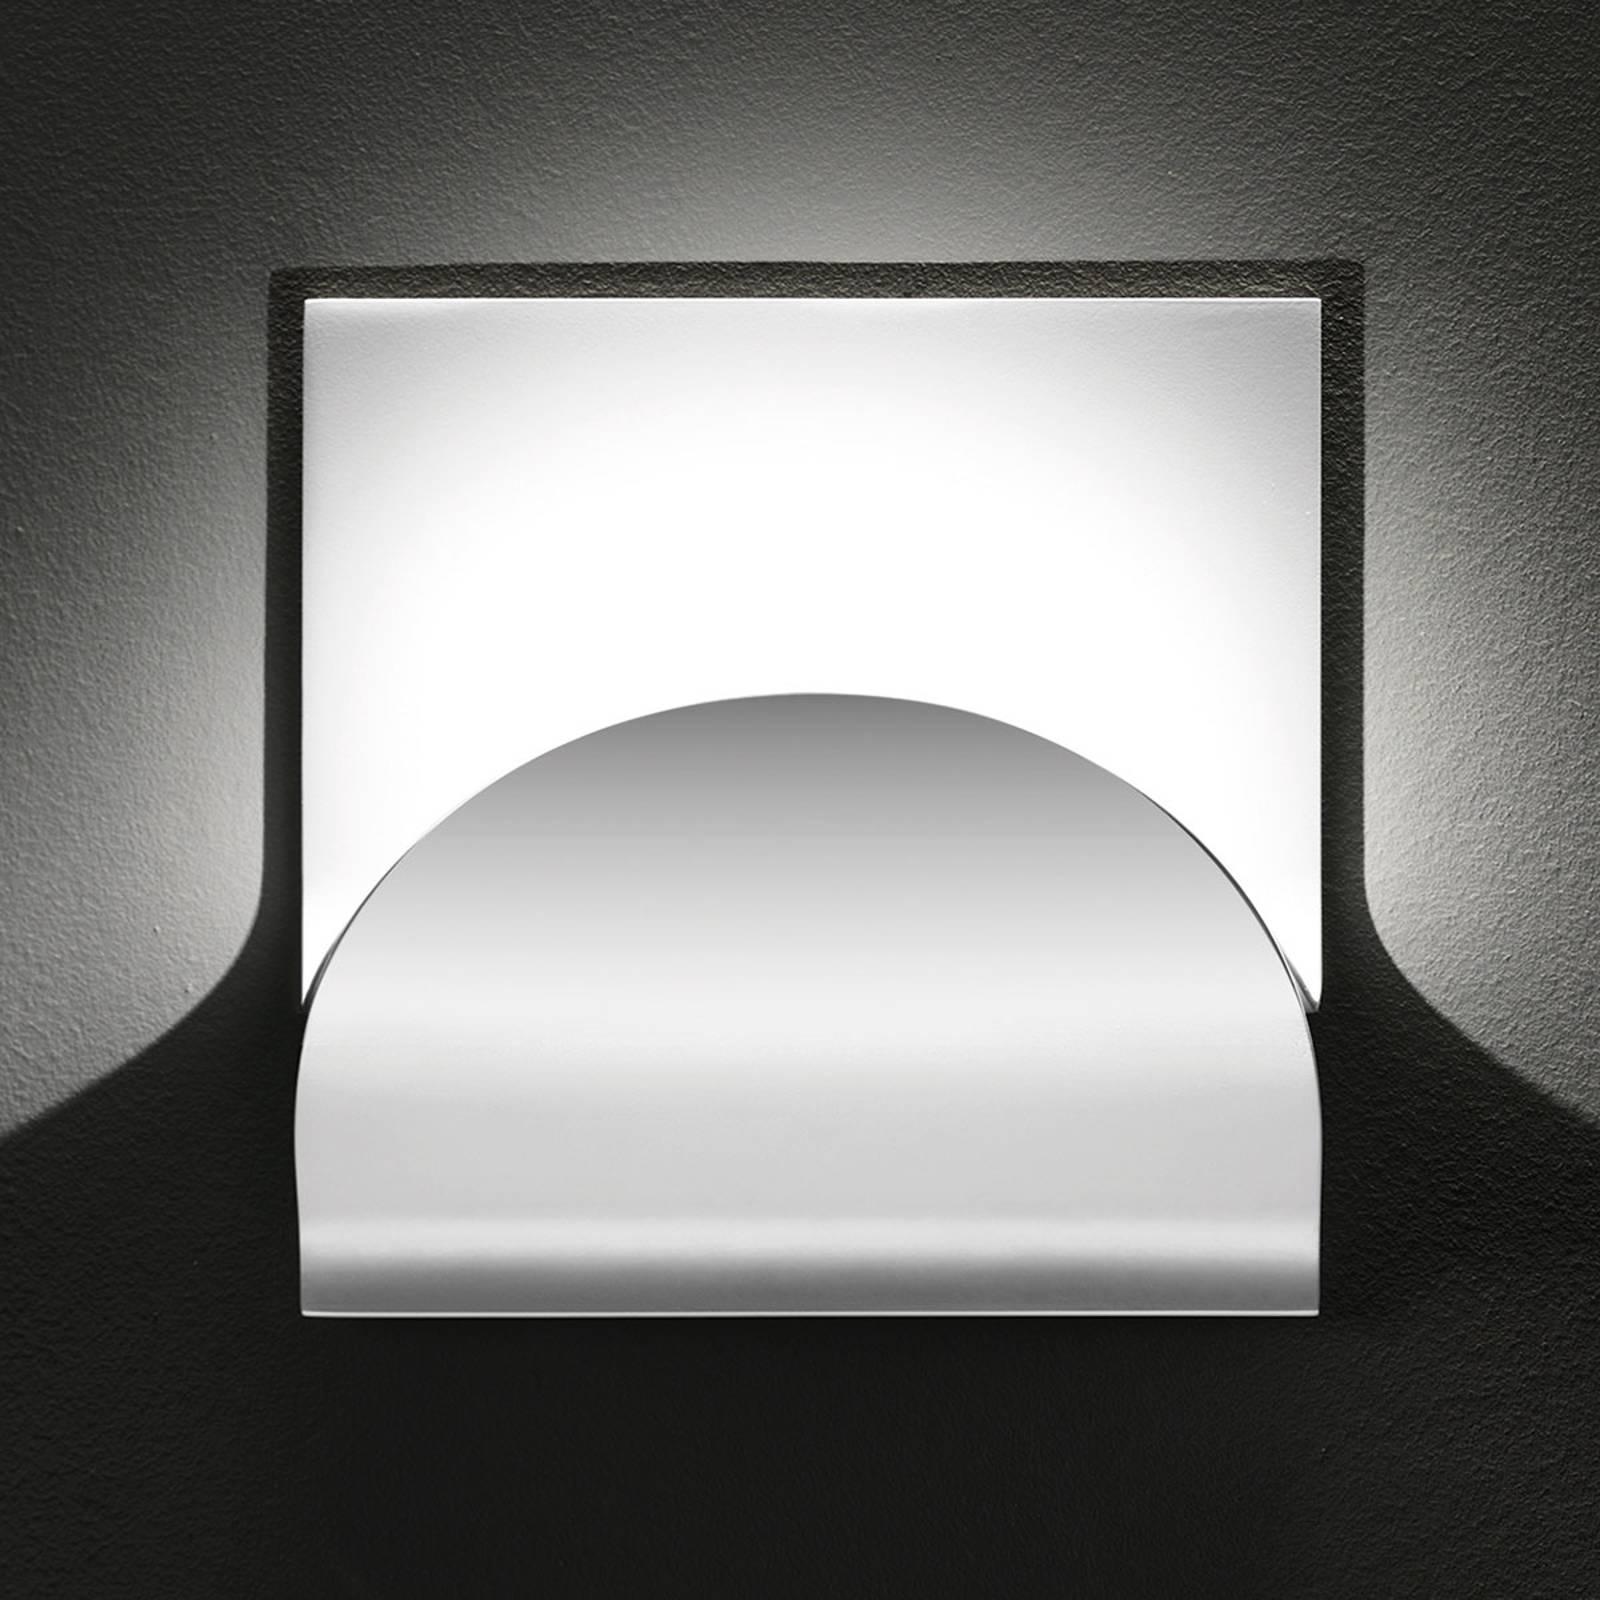 Cini&Nils Incontro LED-Wandleuchte weiß